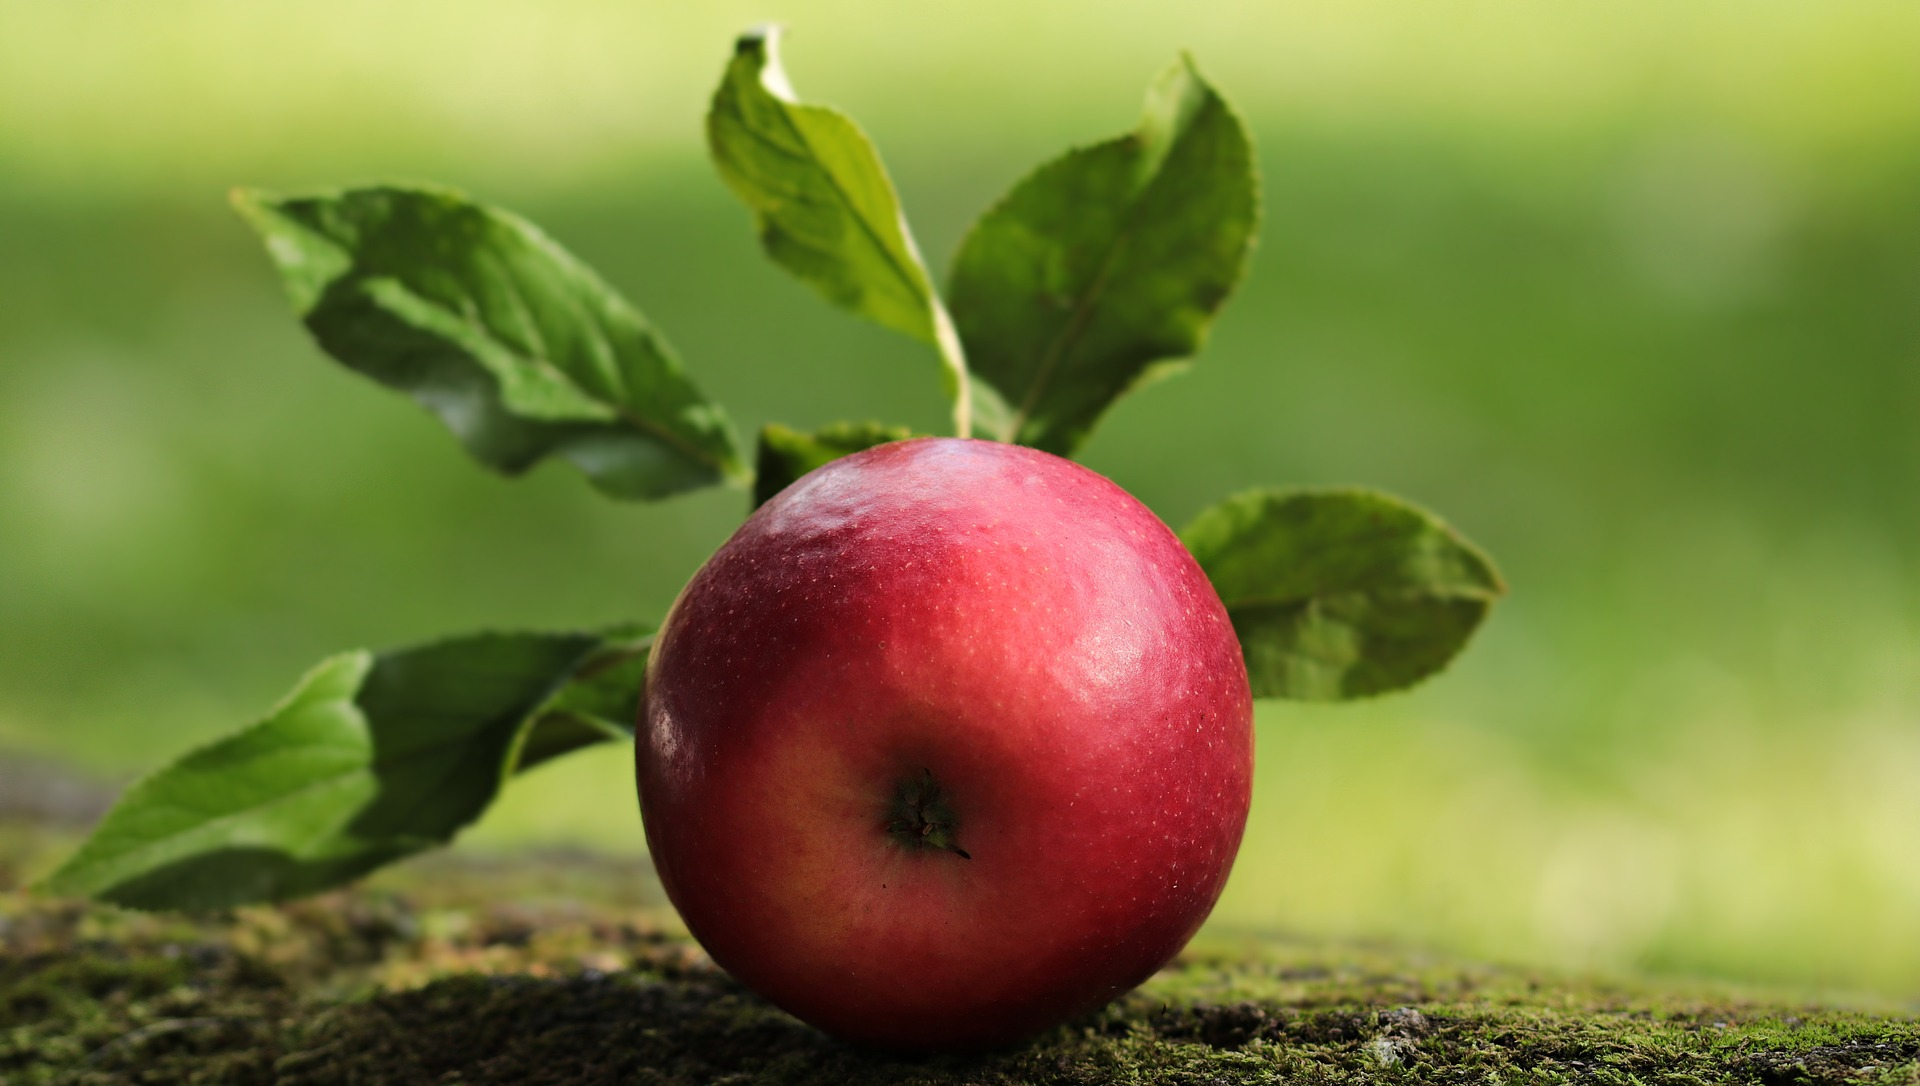 Health - Apple